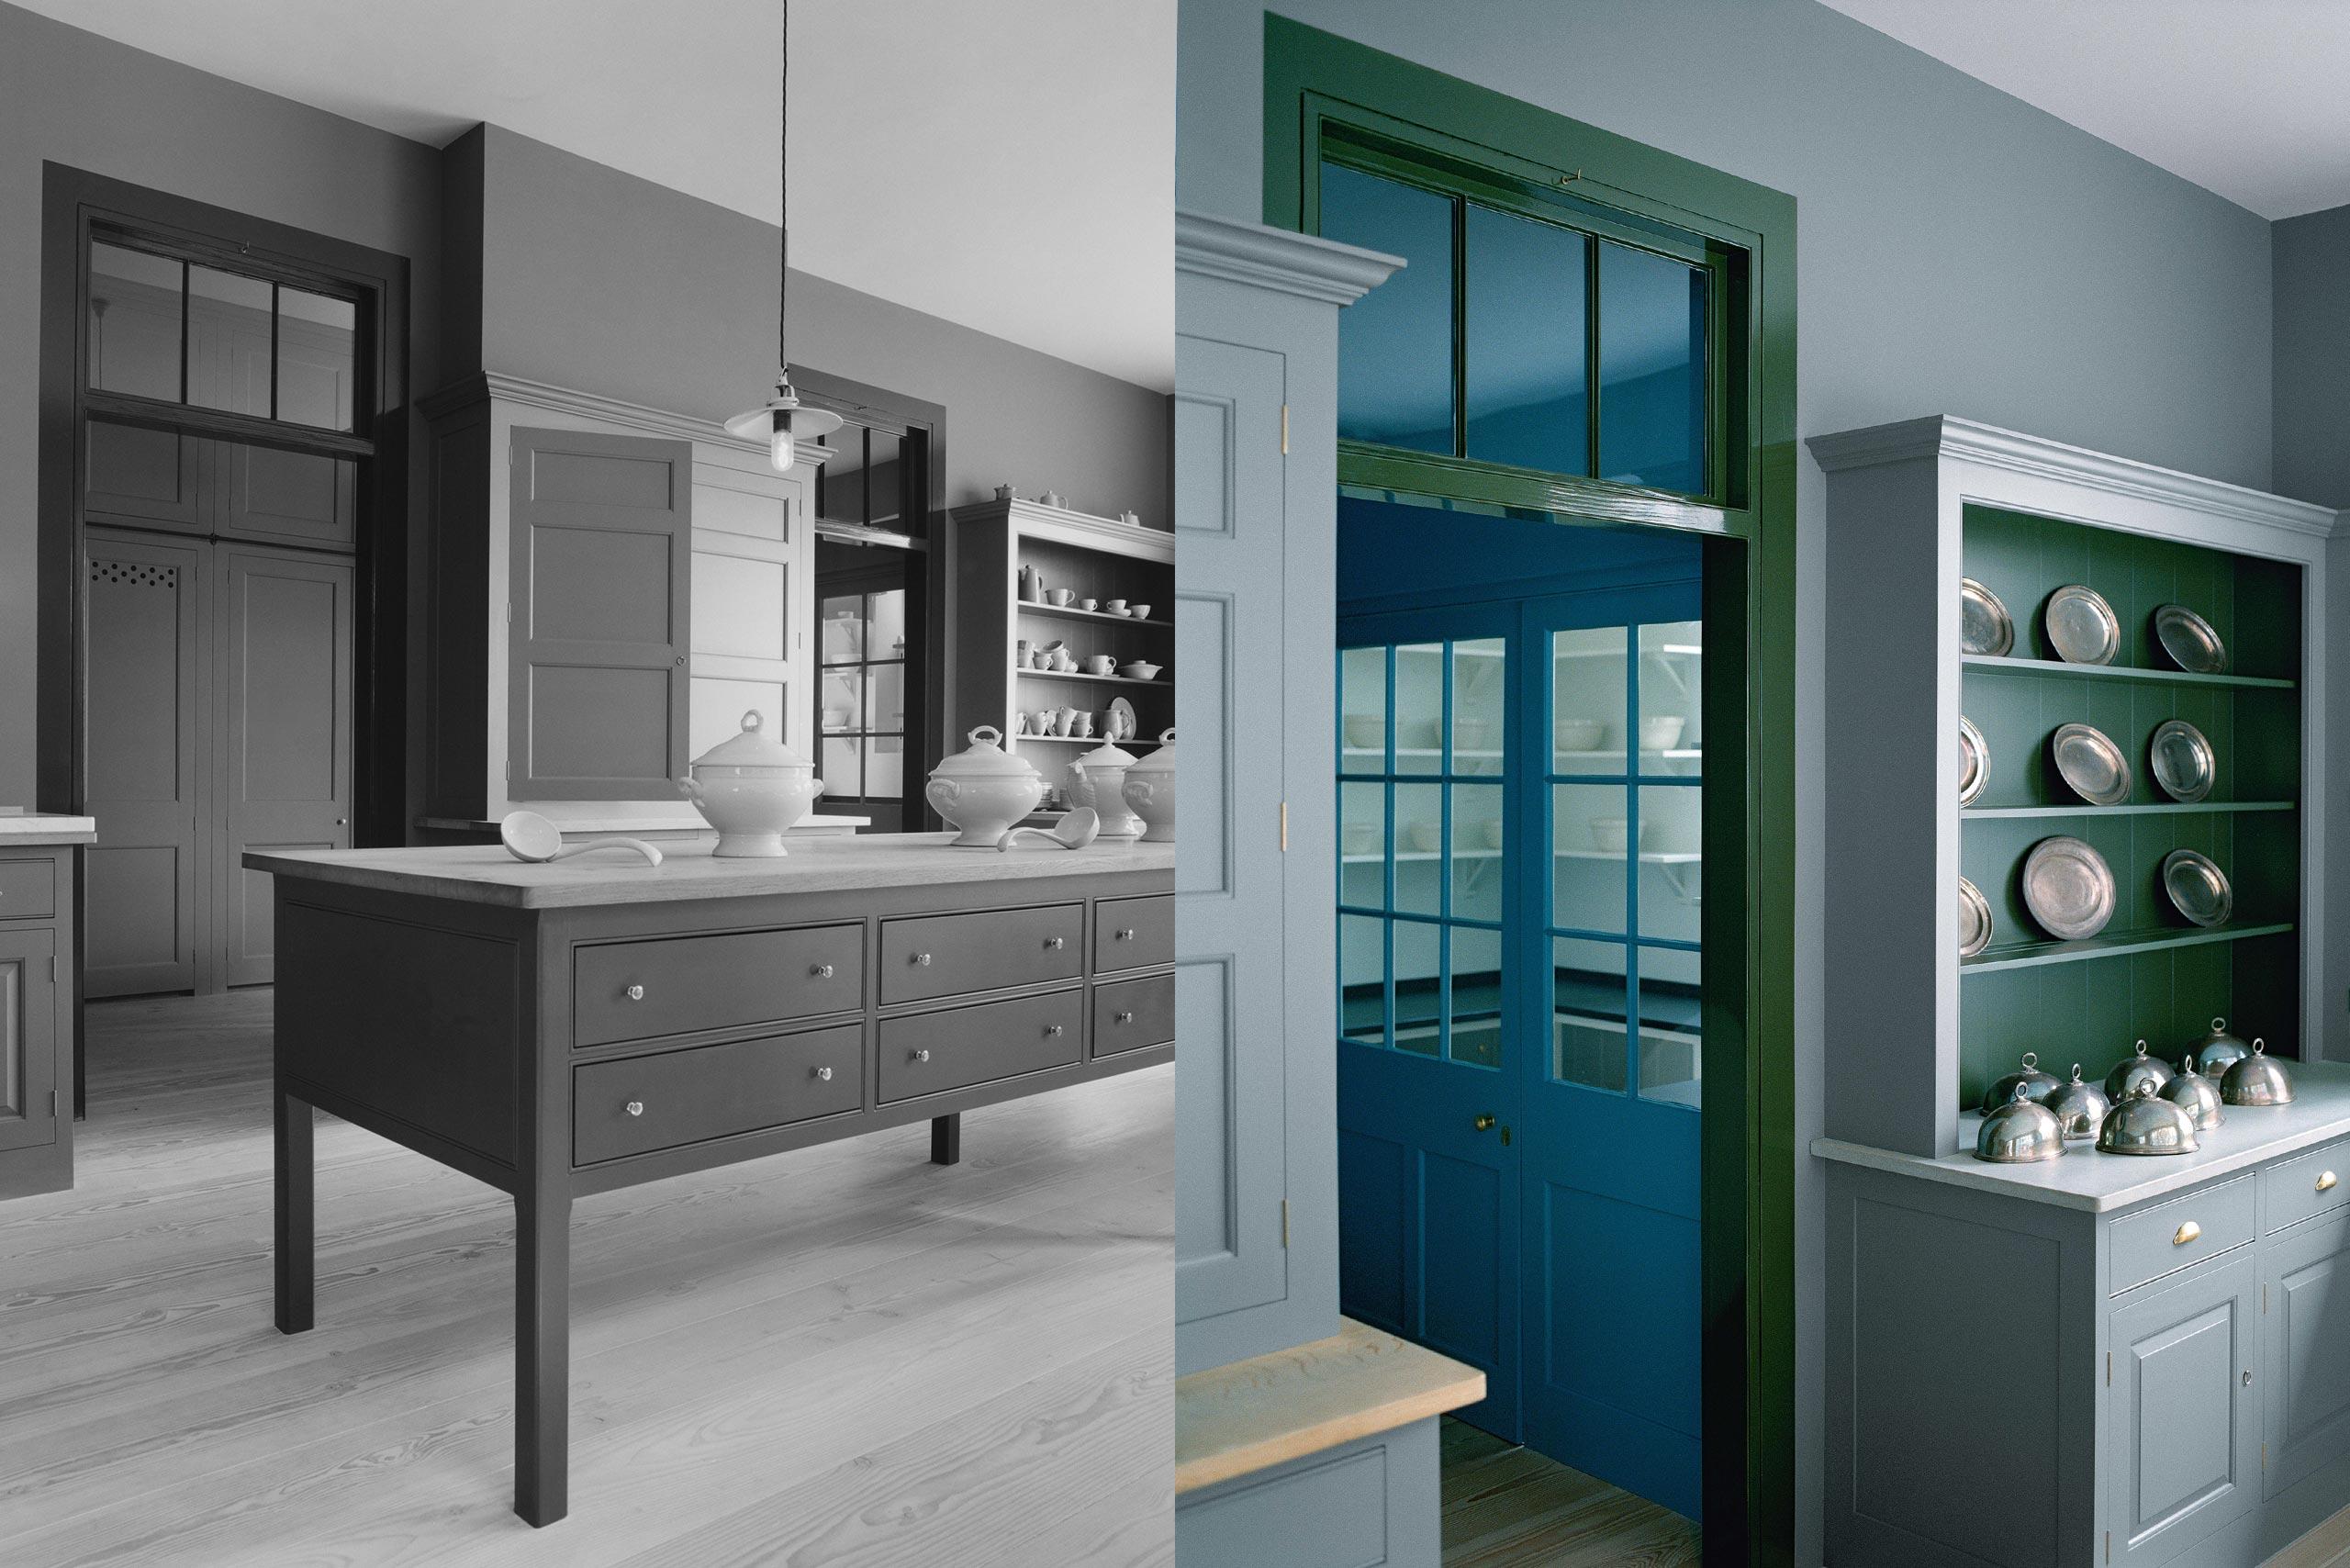 kitchen cabinets cost design online plain english | handmade kitchens